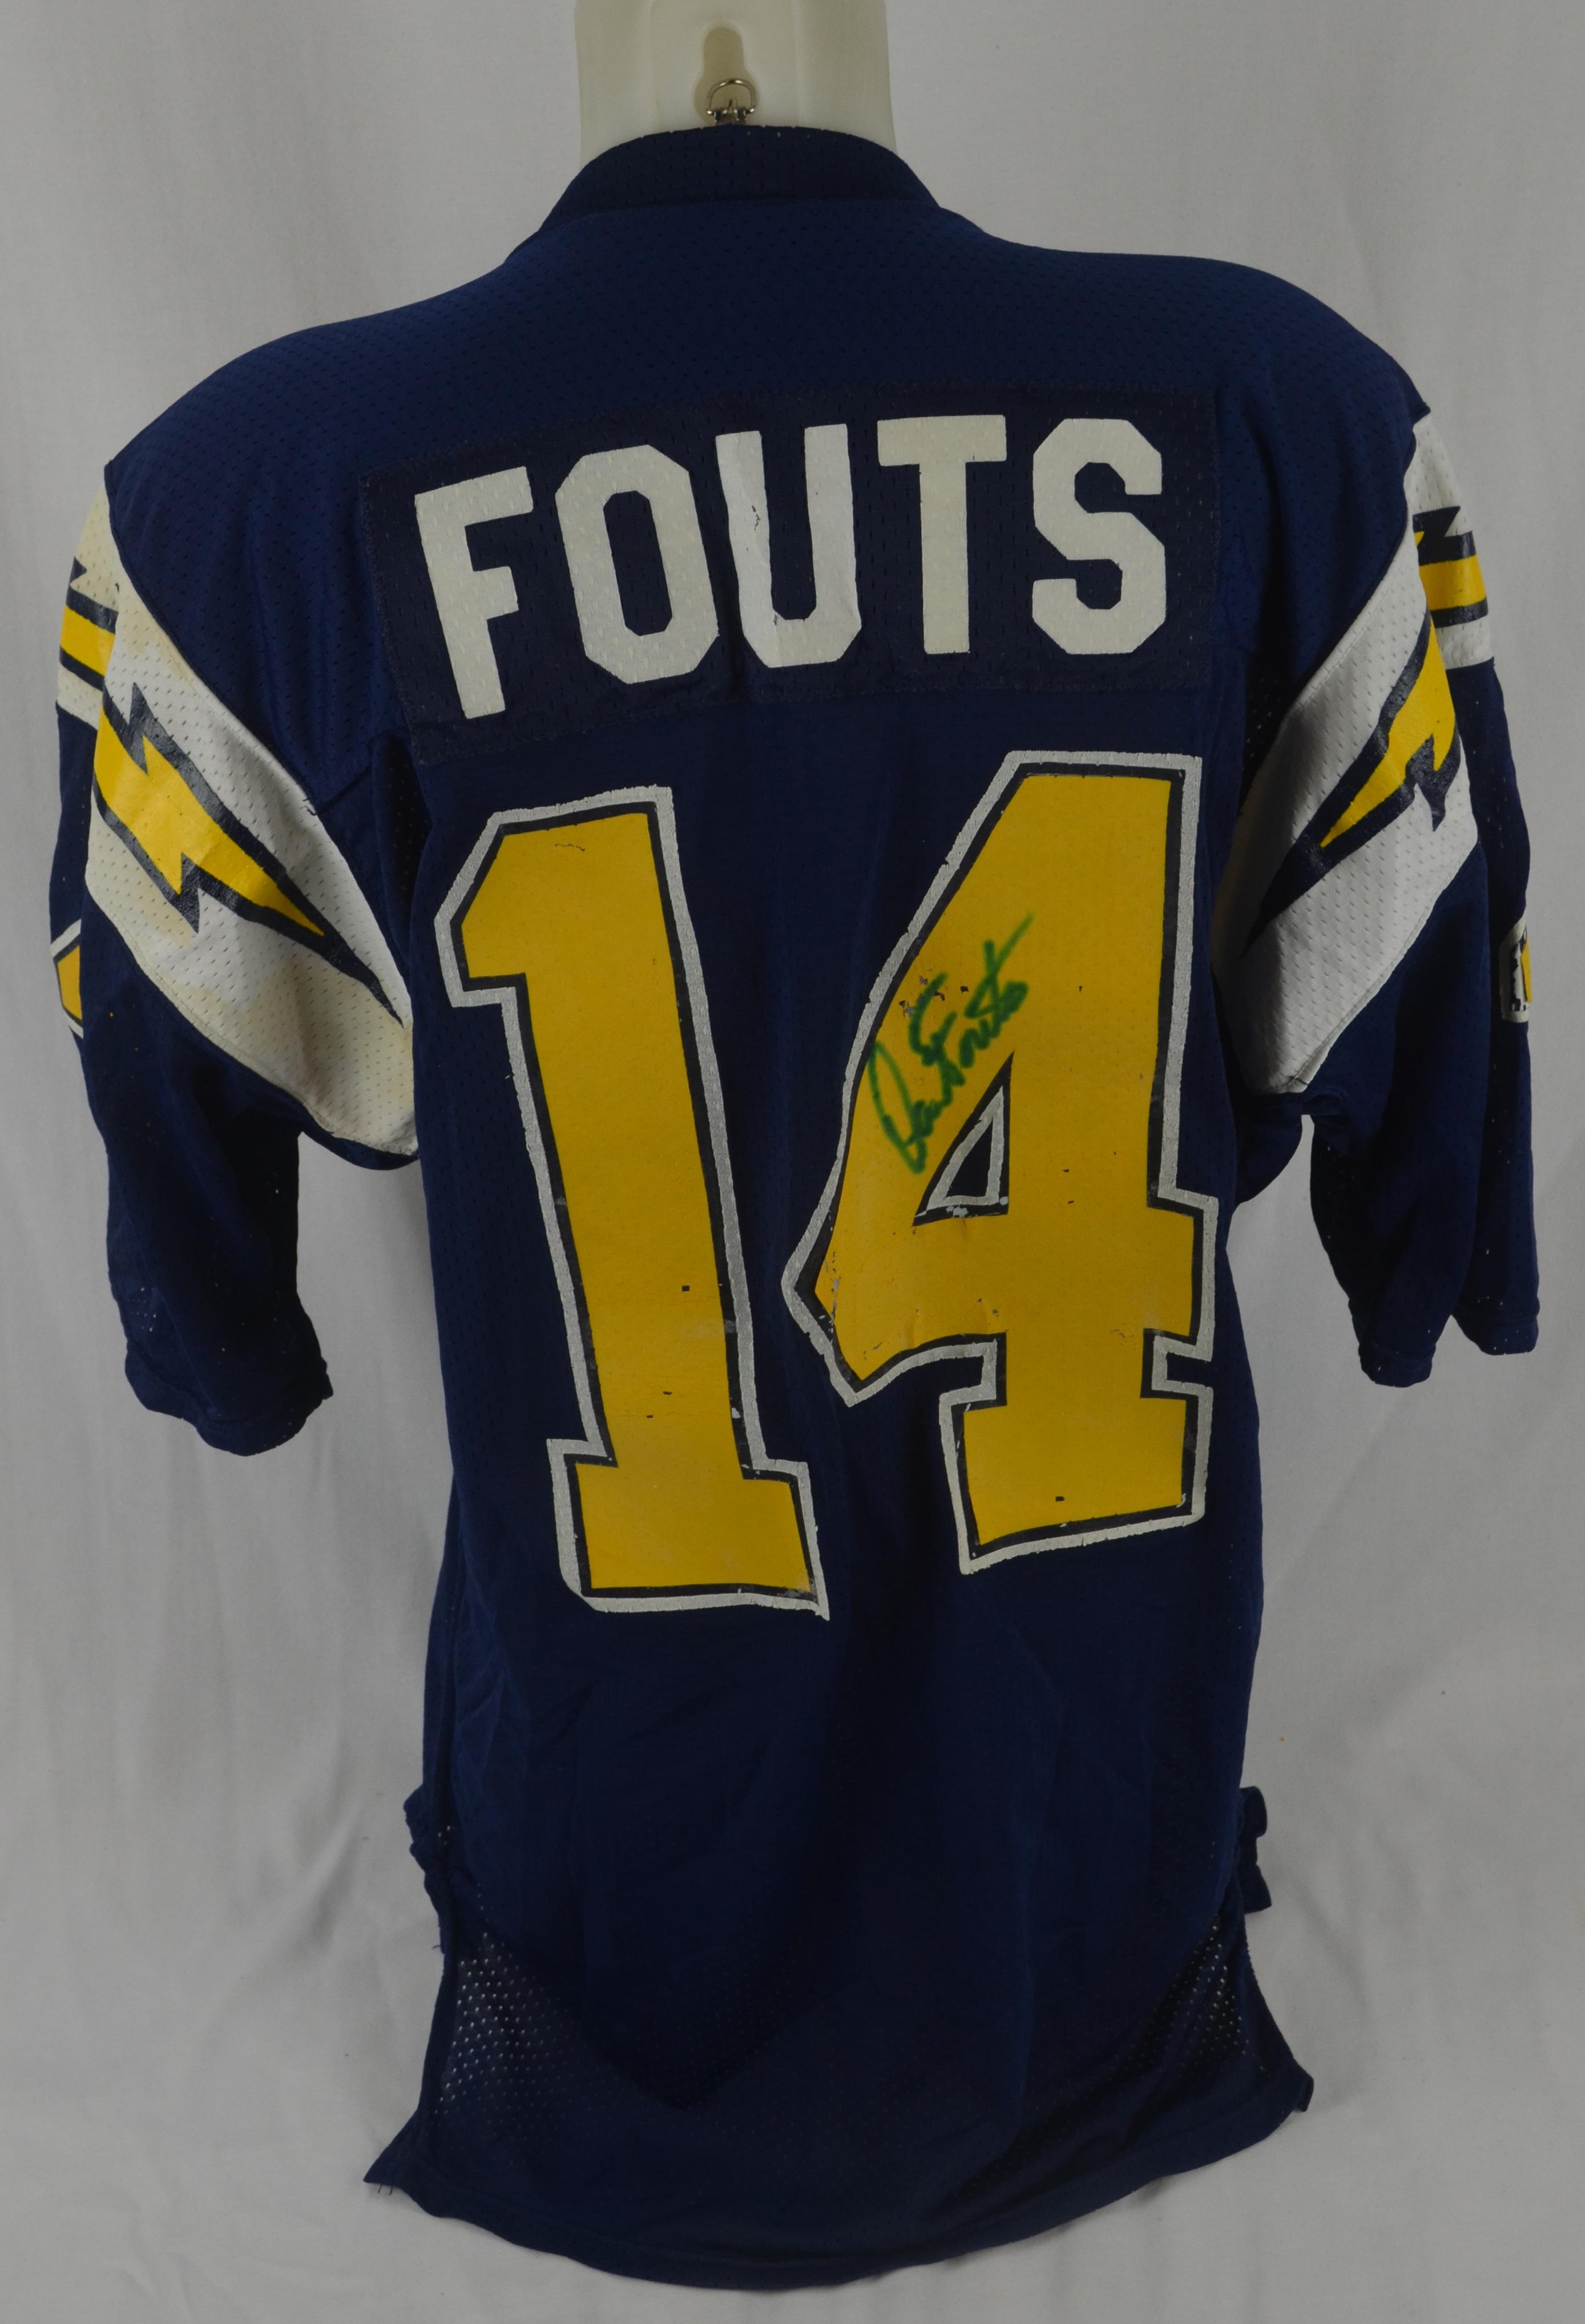 dan fouts jersey, OFF 75%,Buy!